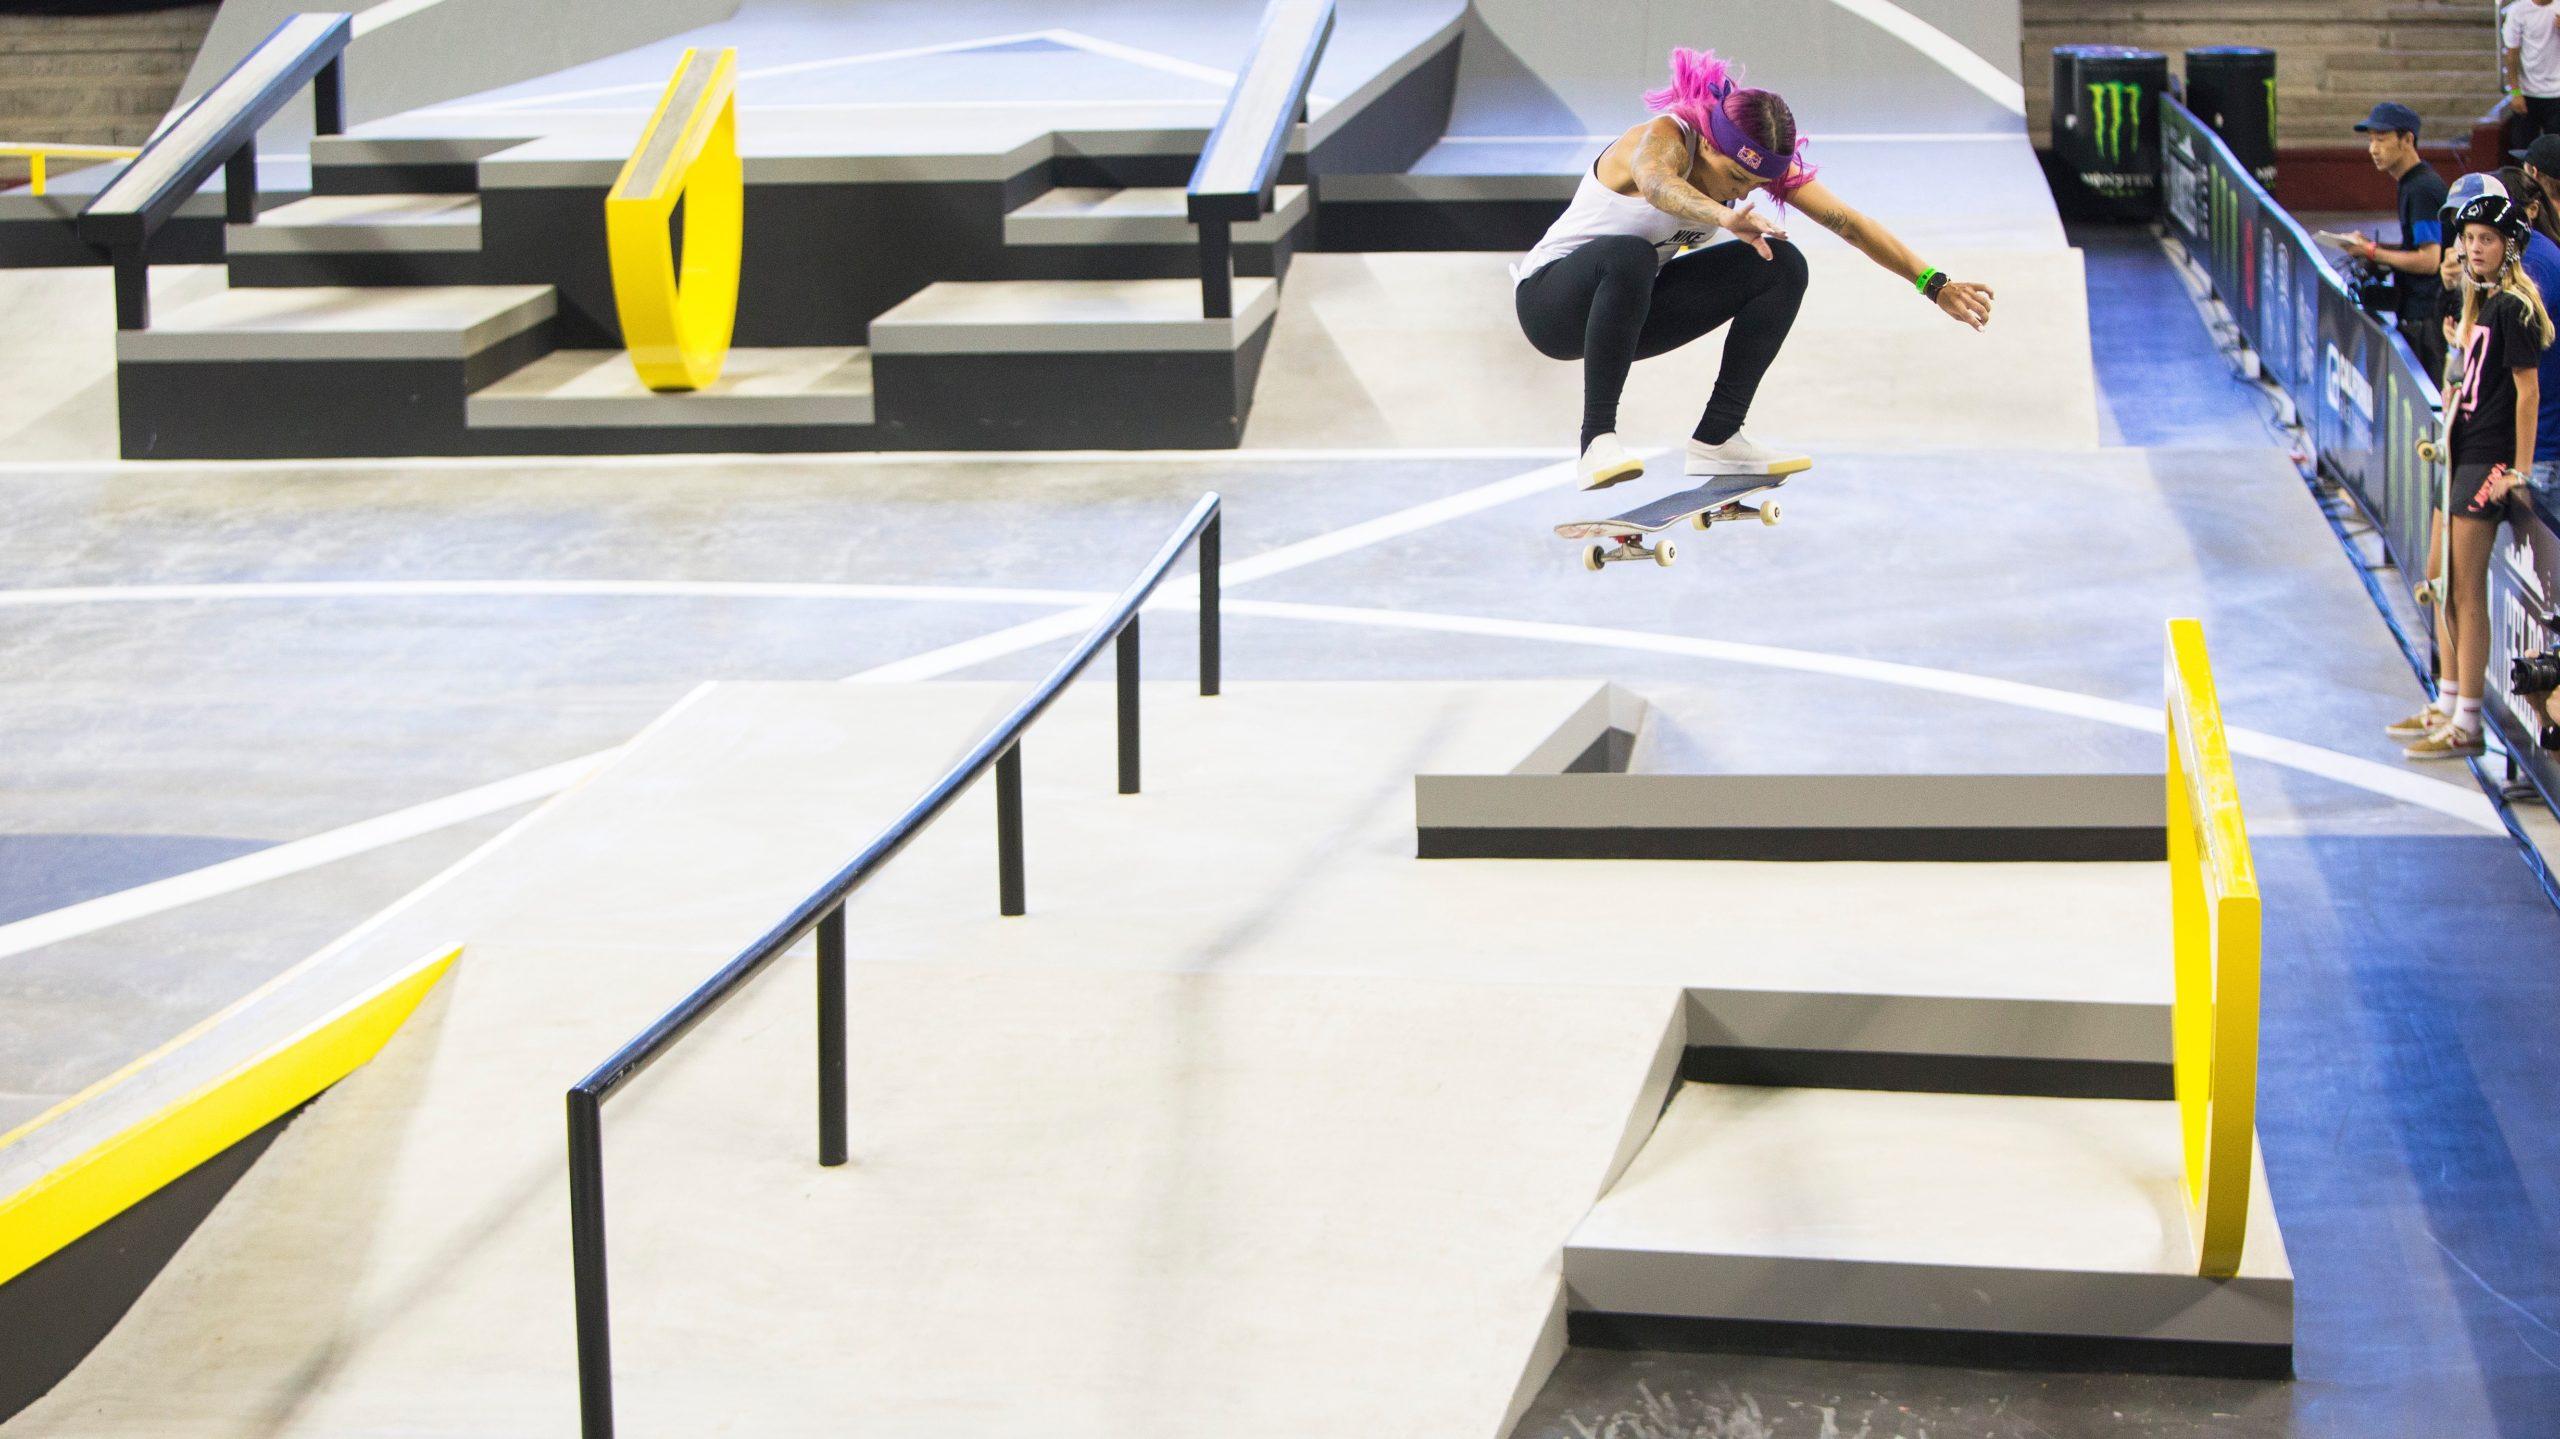 SLS Announces 2020 World Skate Street League Skateboarding World Tour